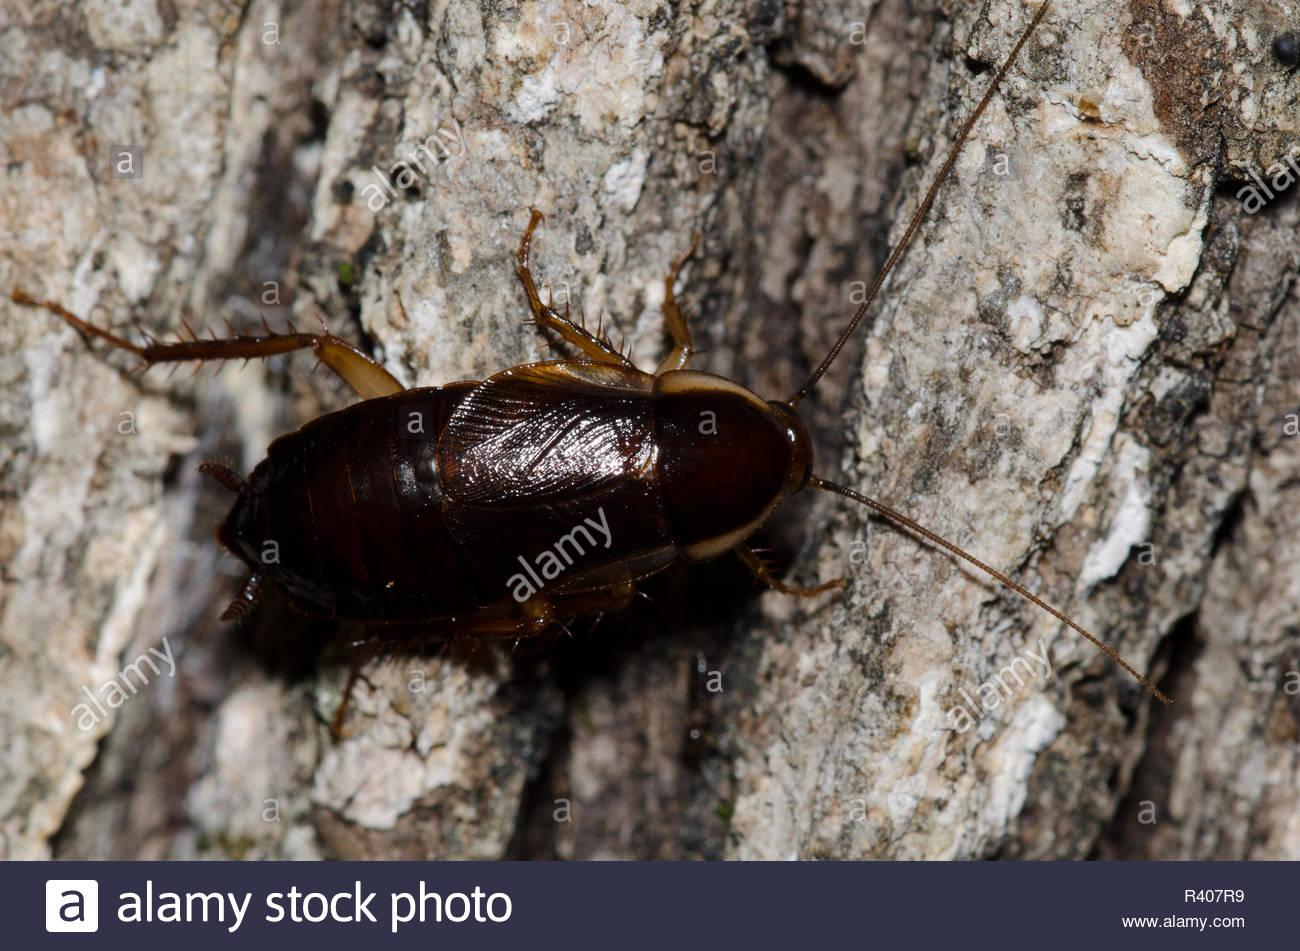 C:\Users\U s e r\Desktop\pics\pennsylvania wood cockroach.jpg